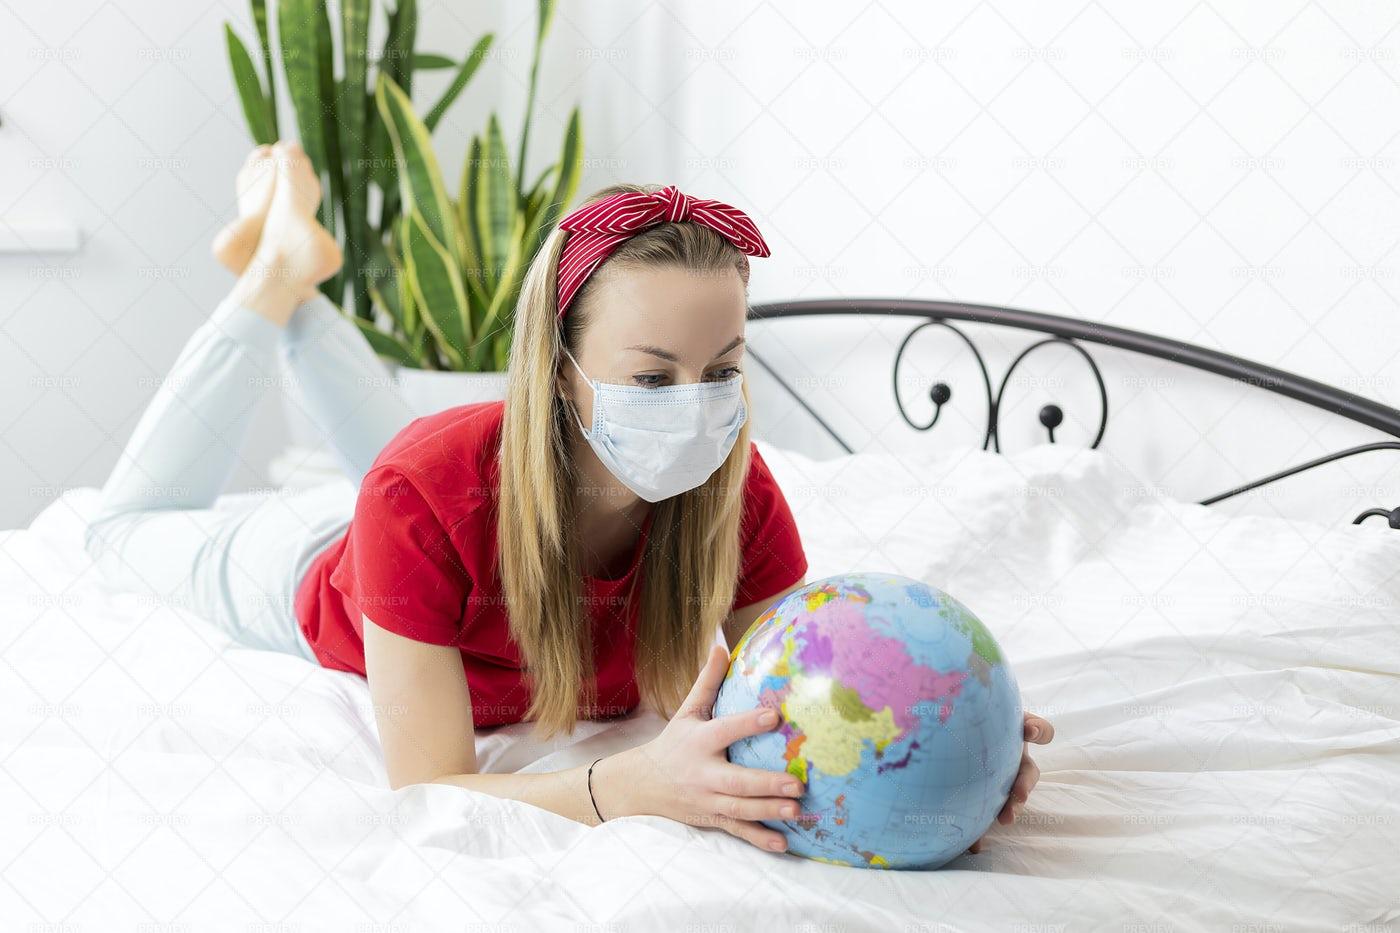 Woman Looking At A World Globe: Stock Photos